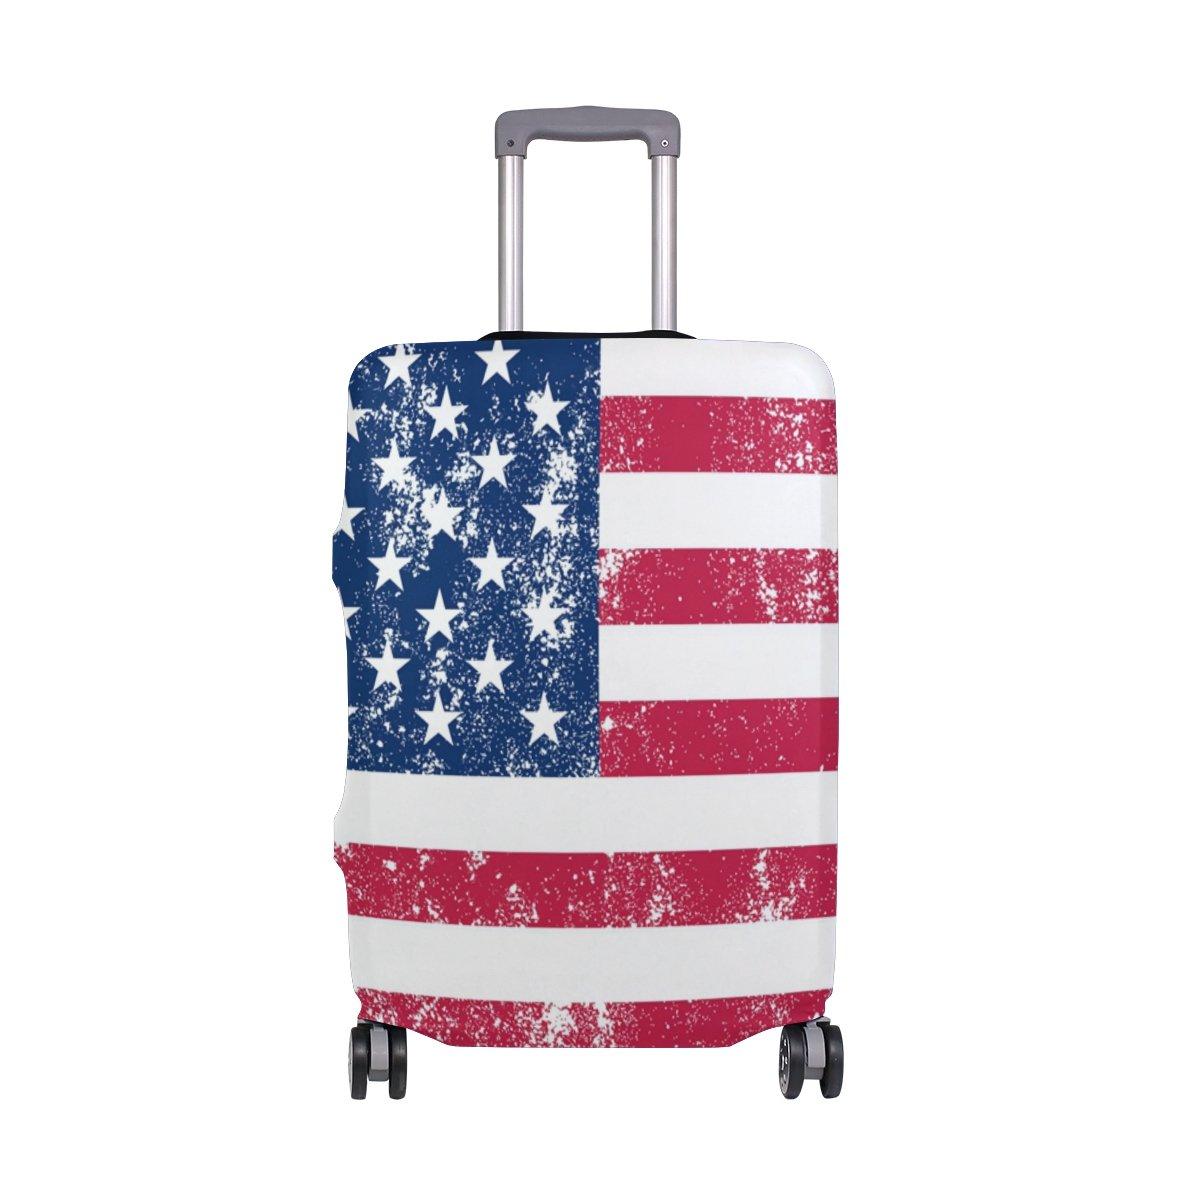 ALAZA USA Drapeau américain vintage couverture bagages Fits 18-20 pouces Valise Spandex Voyage Protector My Daily